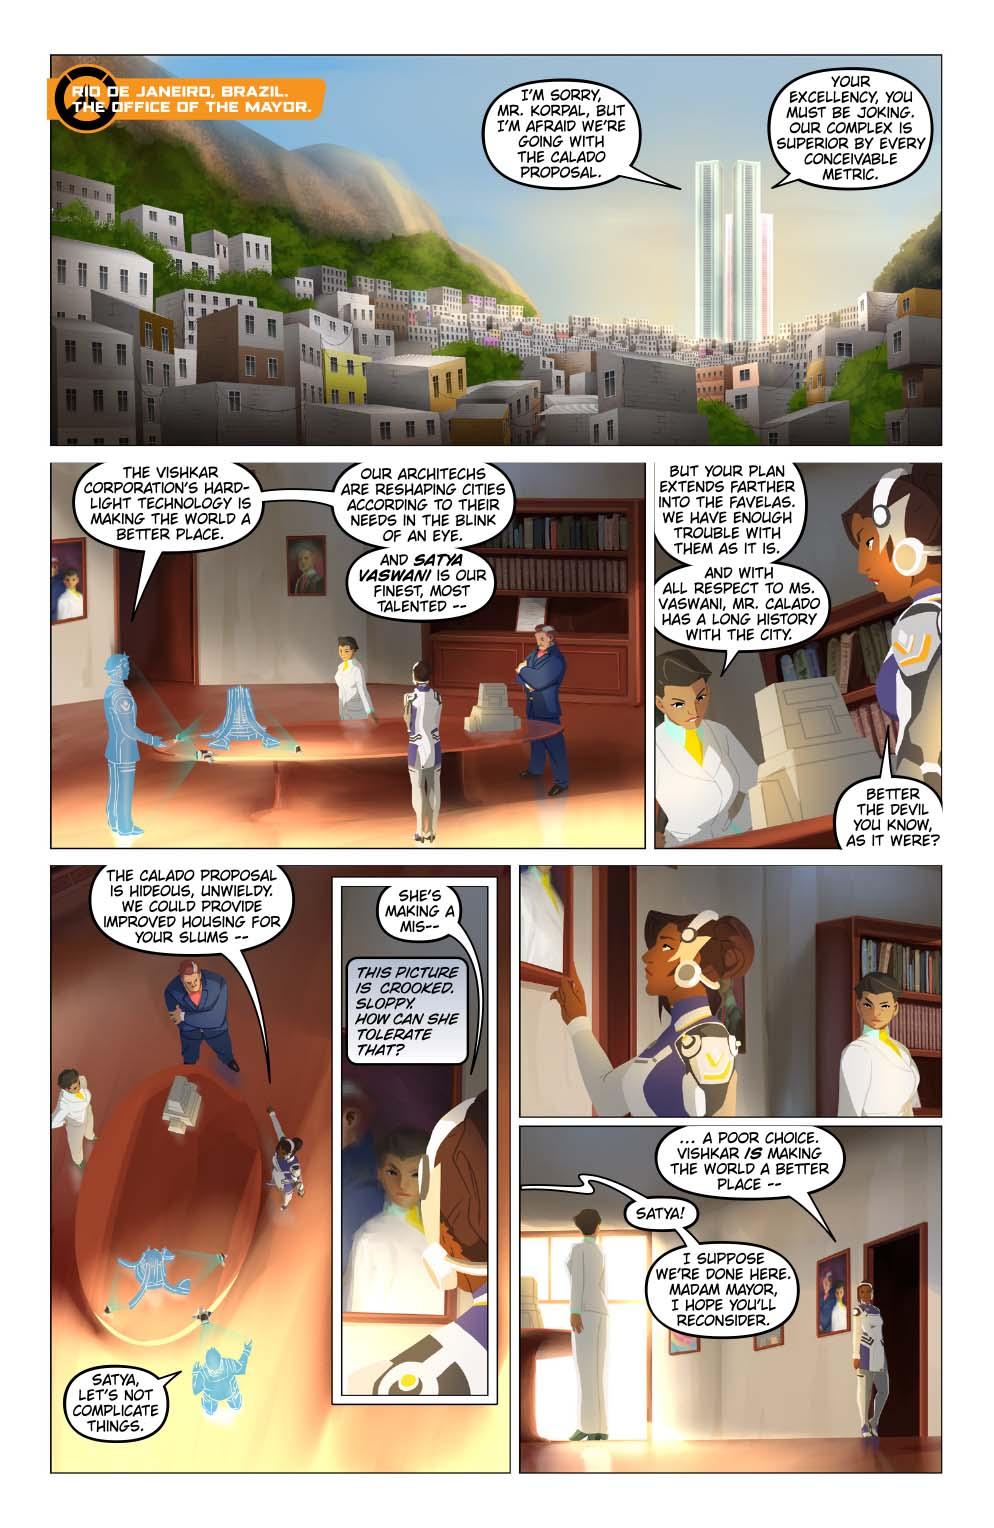 OW_SYMMETRA_Comic_EN-p01.jpg